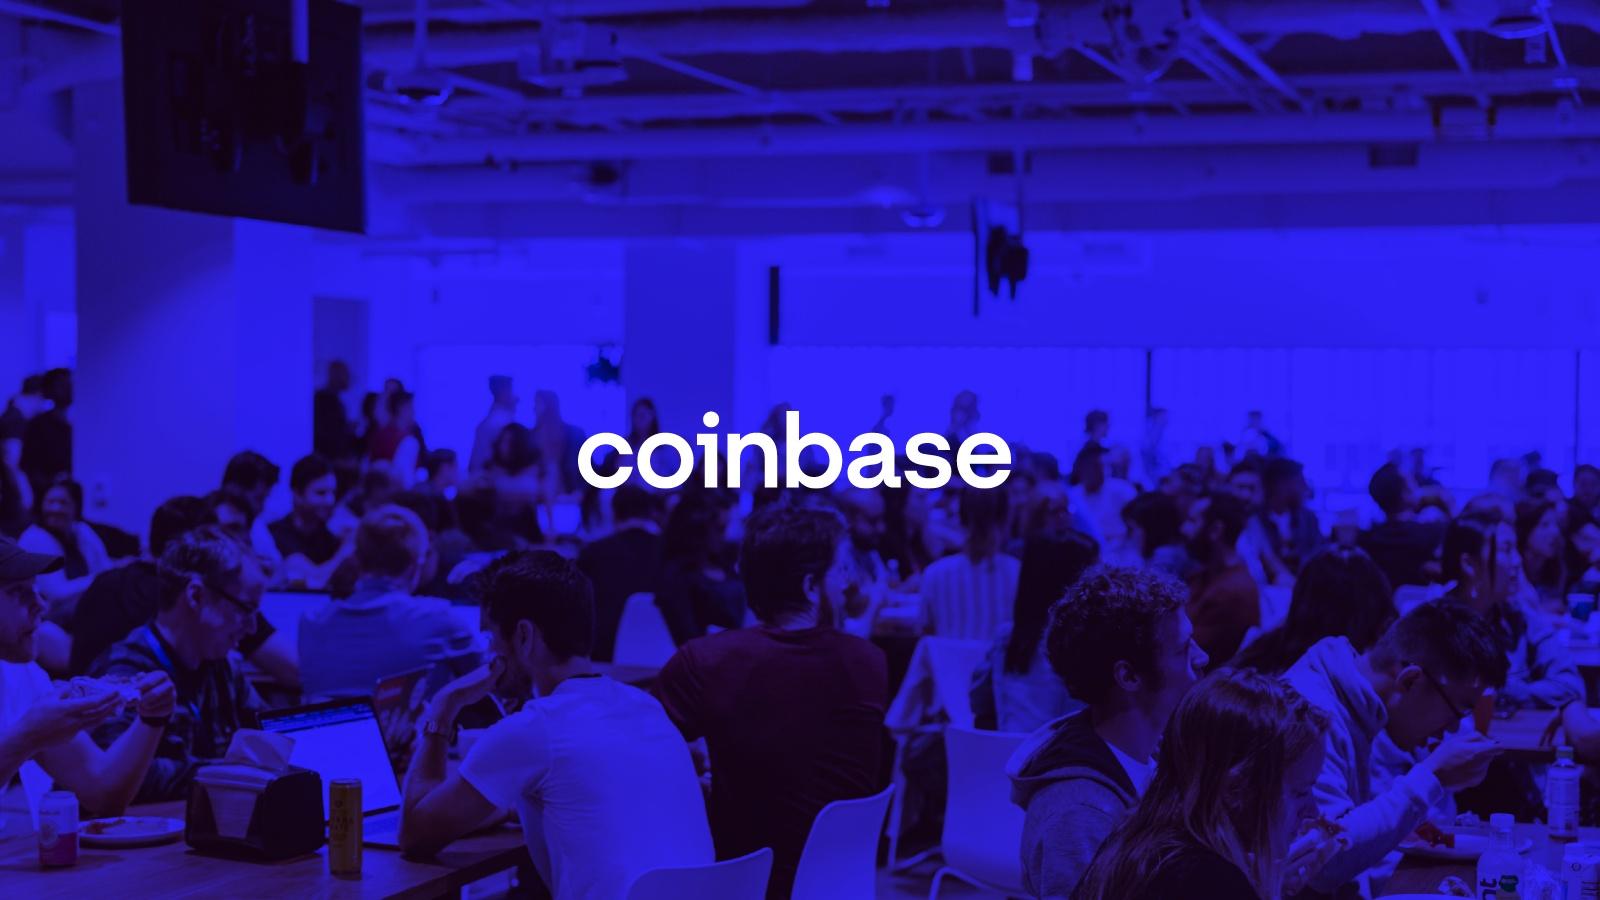 Coinbase seeds panic among users with erroneous 2FA change alerts